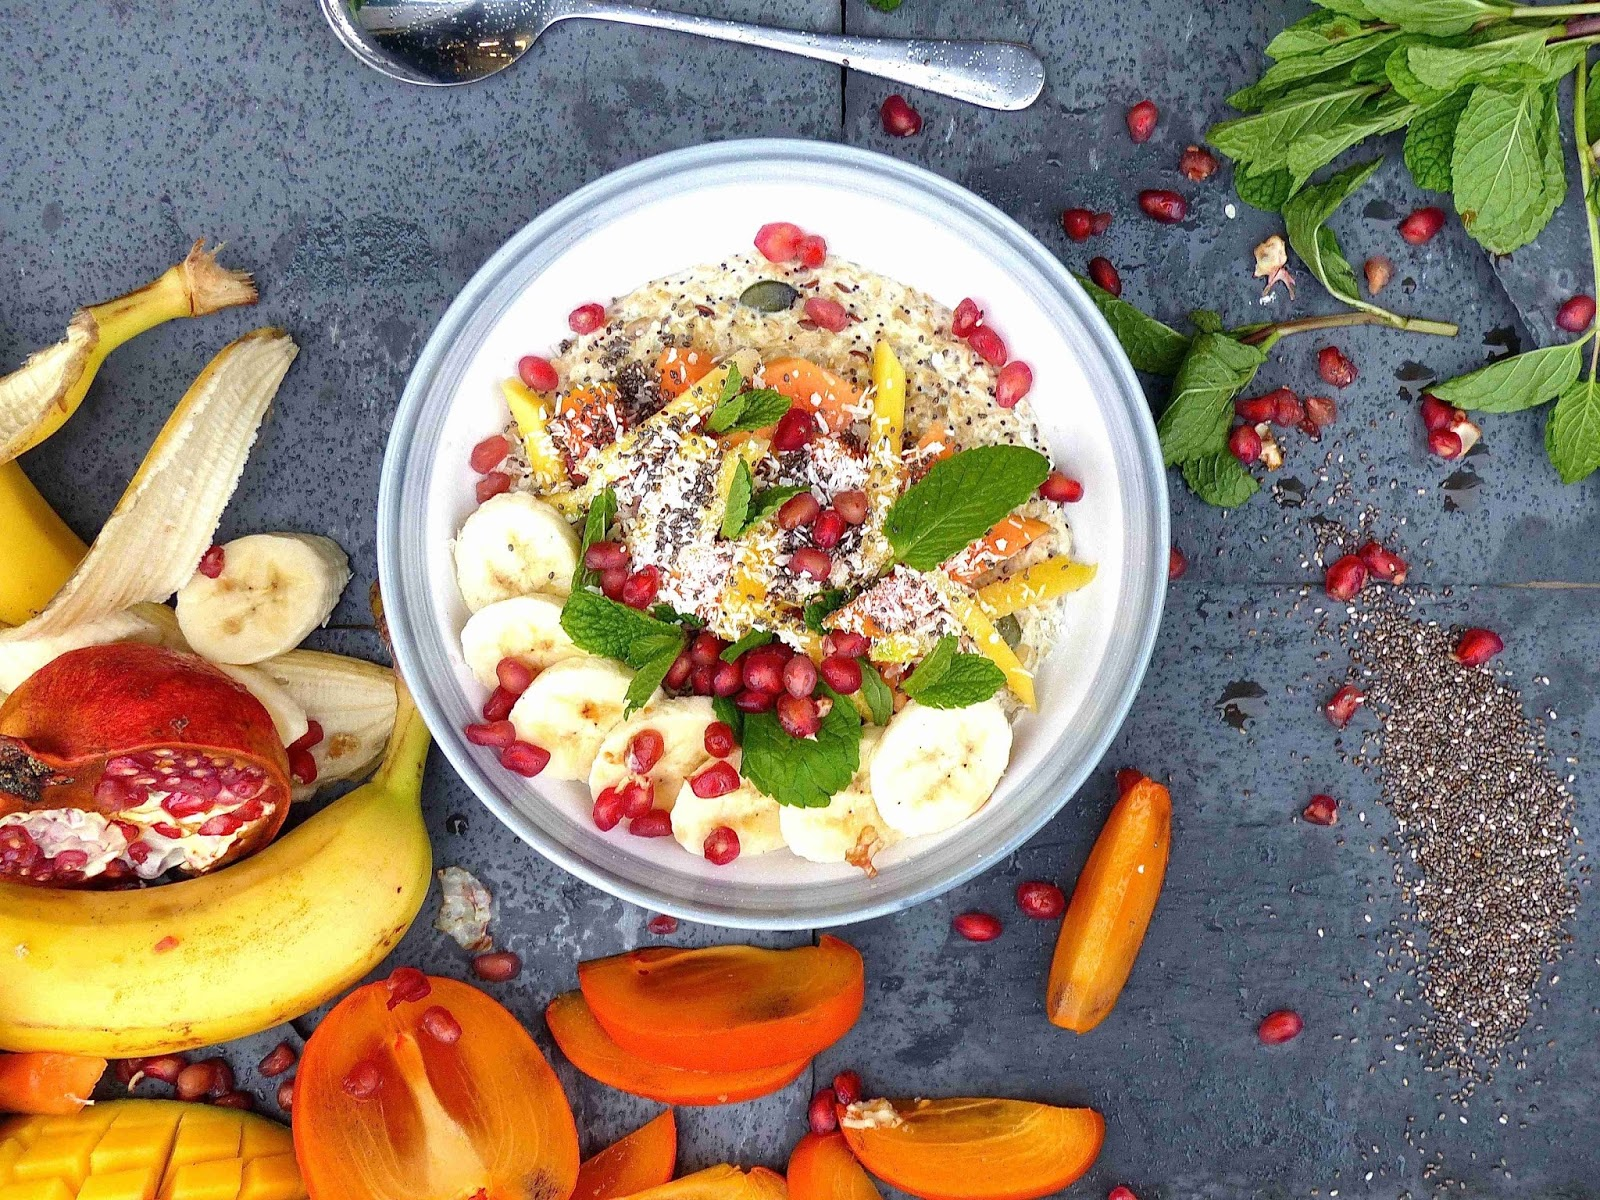 How To Make Nutritious, Fresh and Fruity Tropical Porridge